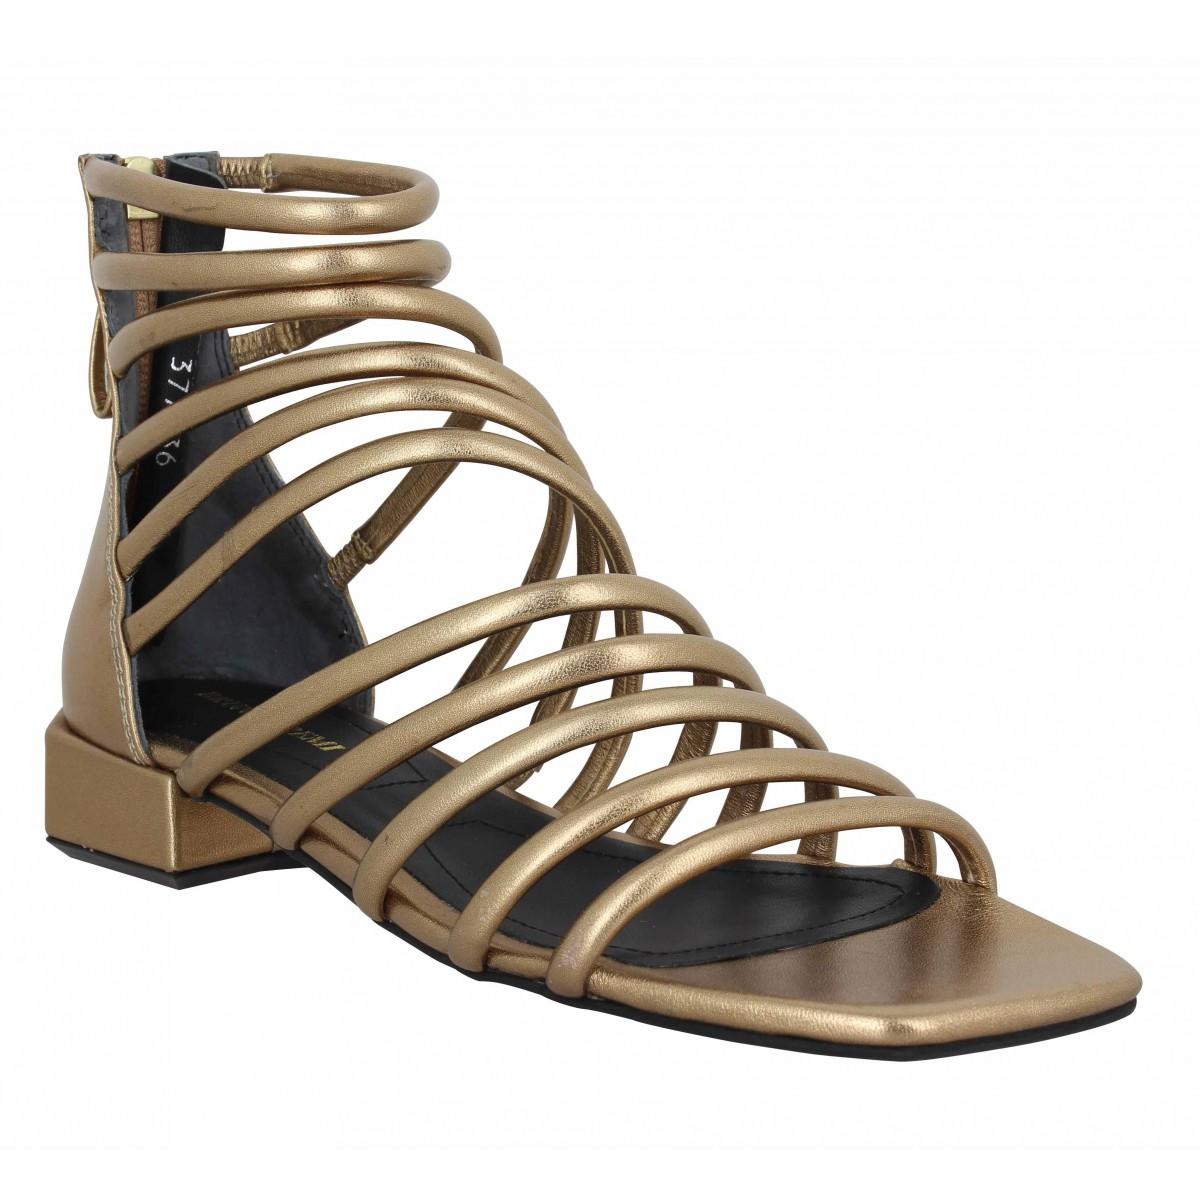 Sandales talons BRUNO PREMI 803 cuir lame Femme Or